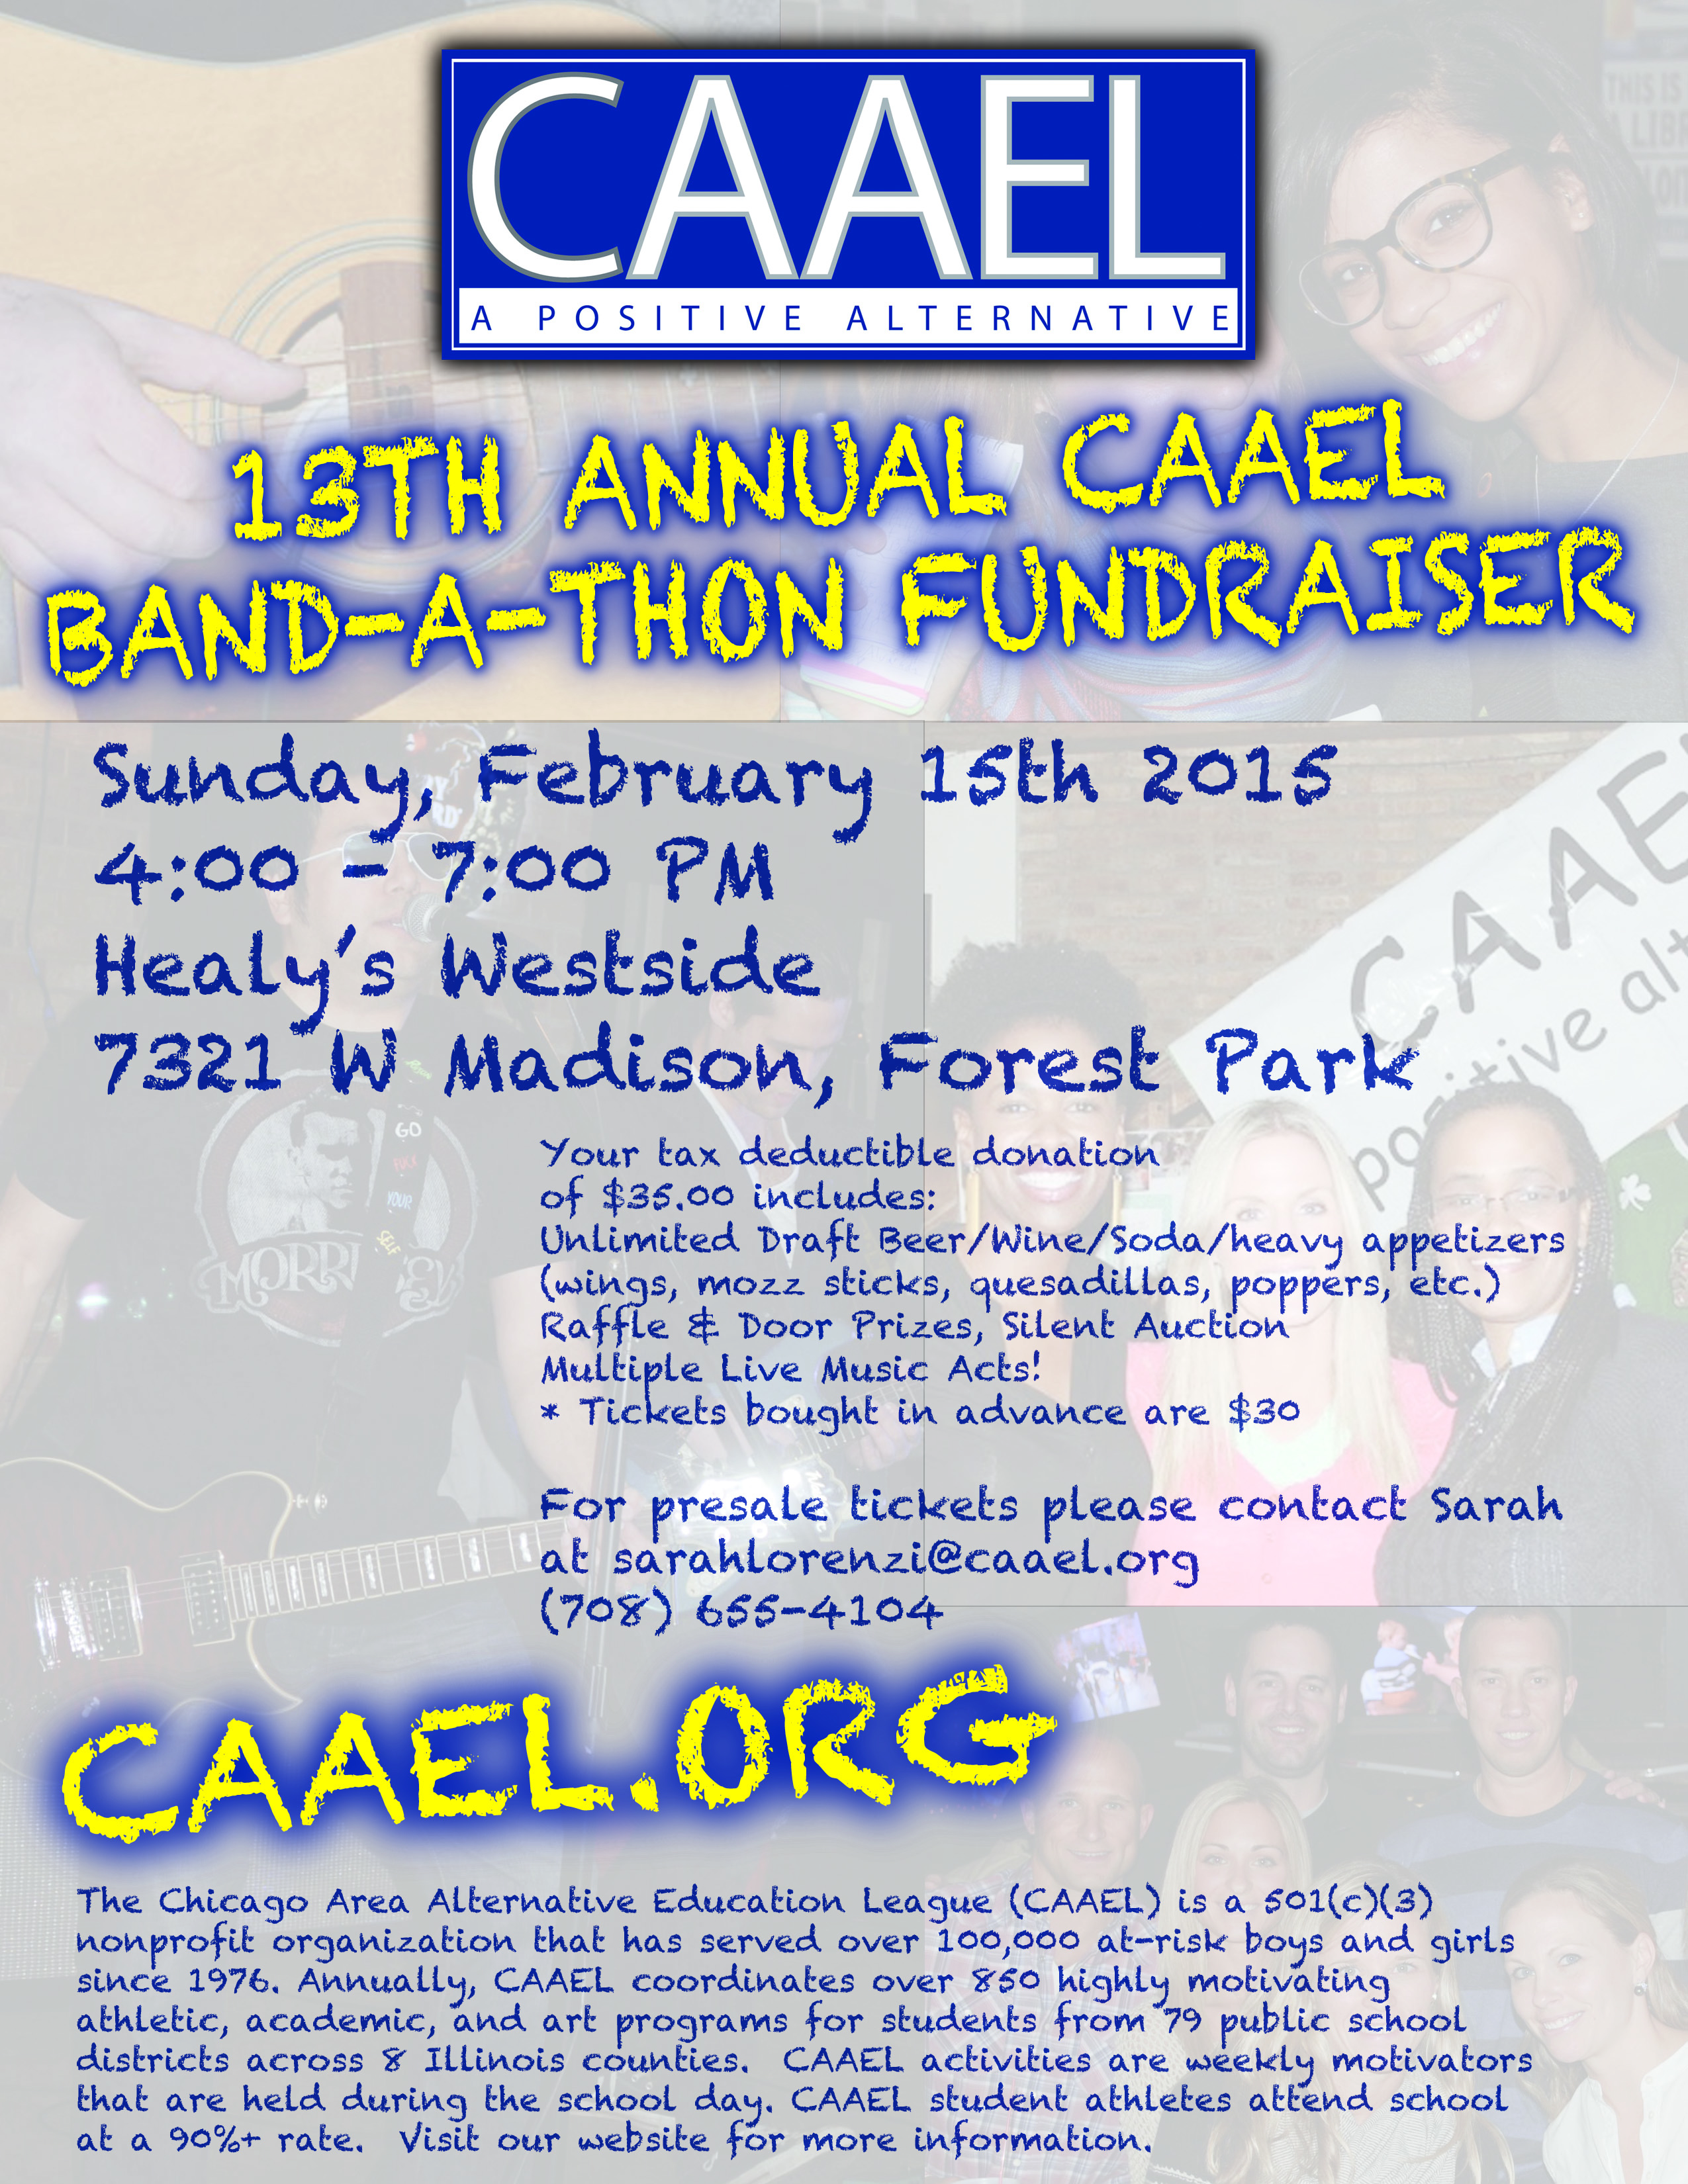 CAAEL '15 Bandathon Flyer